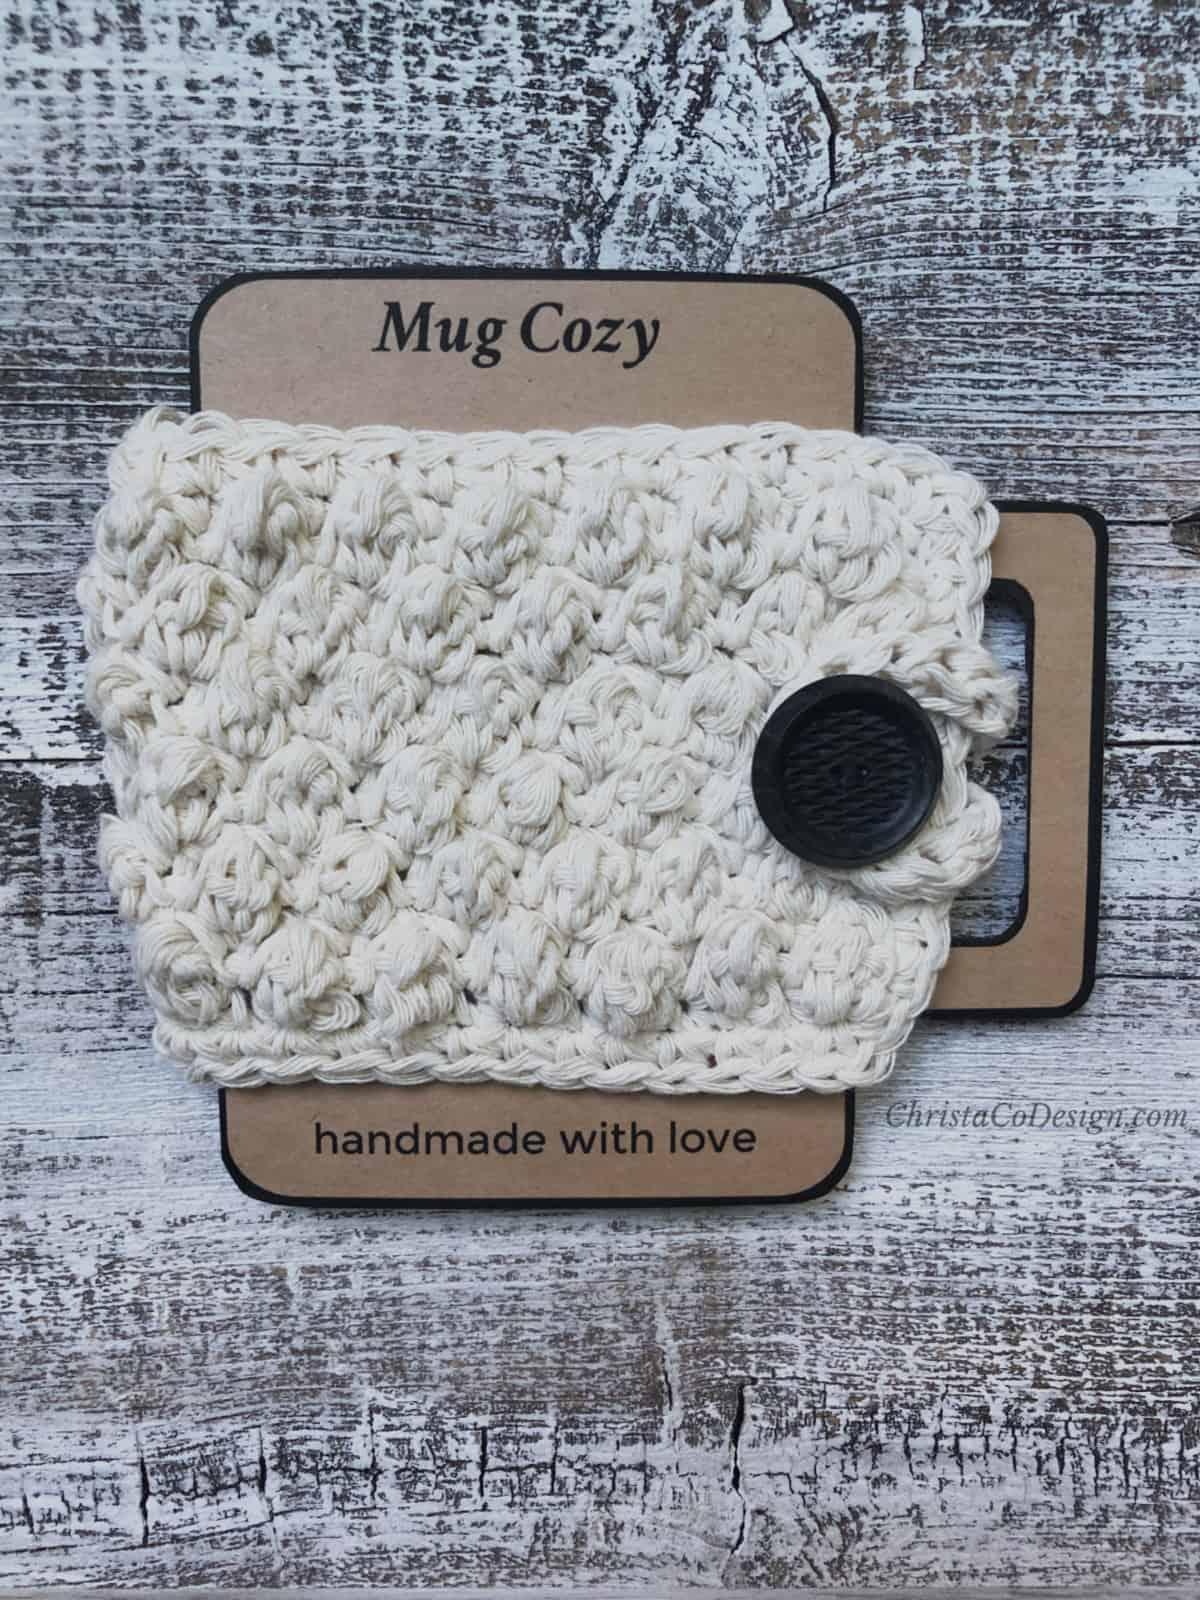 picture of crochet mug cozy on cardboard printable